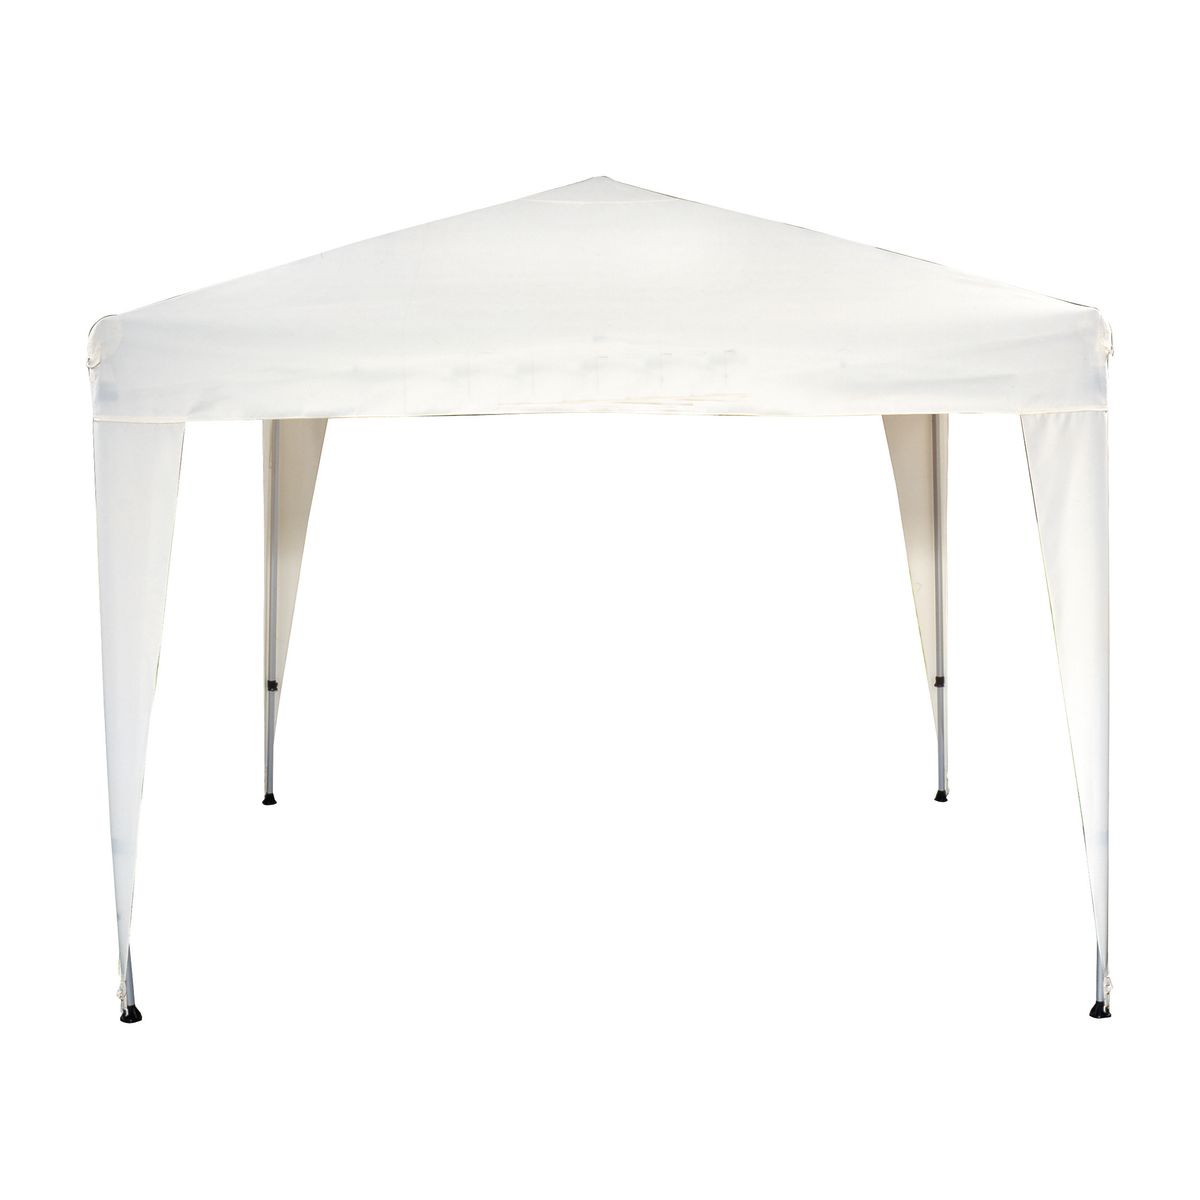 Gazebo arona copertura bianca 3 x 3 m prezzi e offerte online for Gazebo bianco leroy merlin